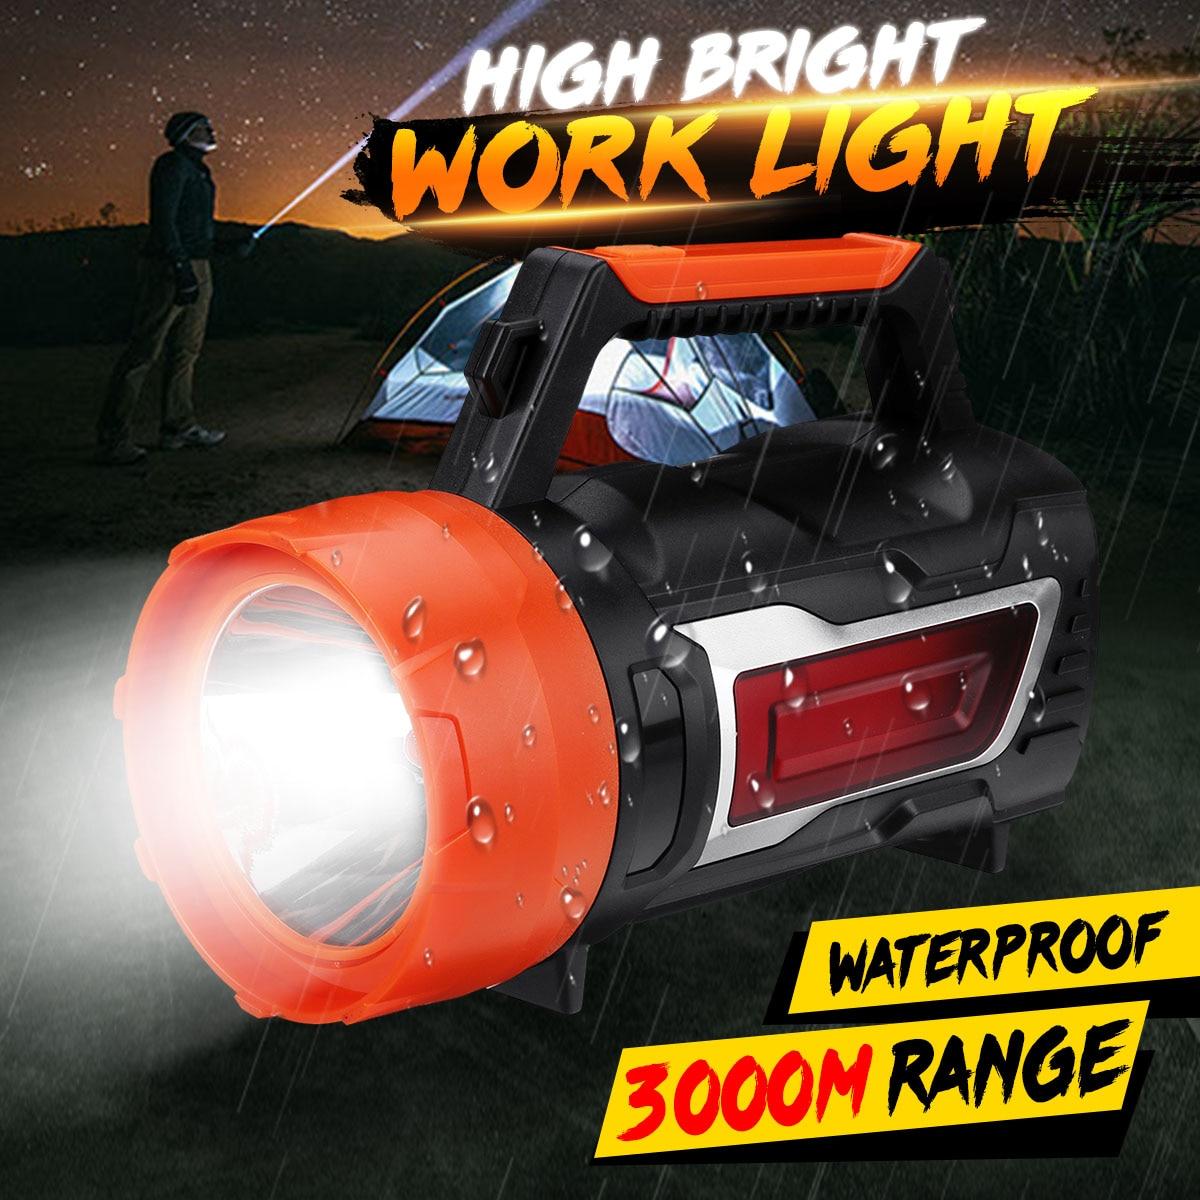 500w High Power Super Bright LED Searchlight Outdoor Handheld Portable Spotlight Lantern Rechargeable Flashlight USB Lamp